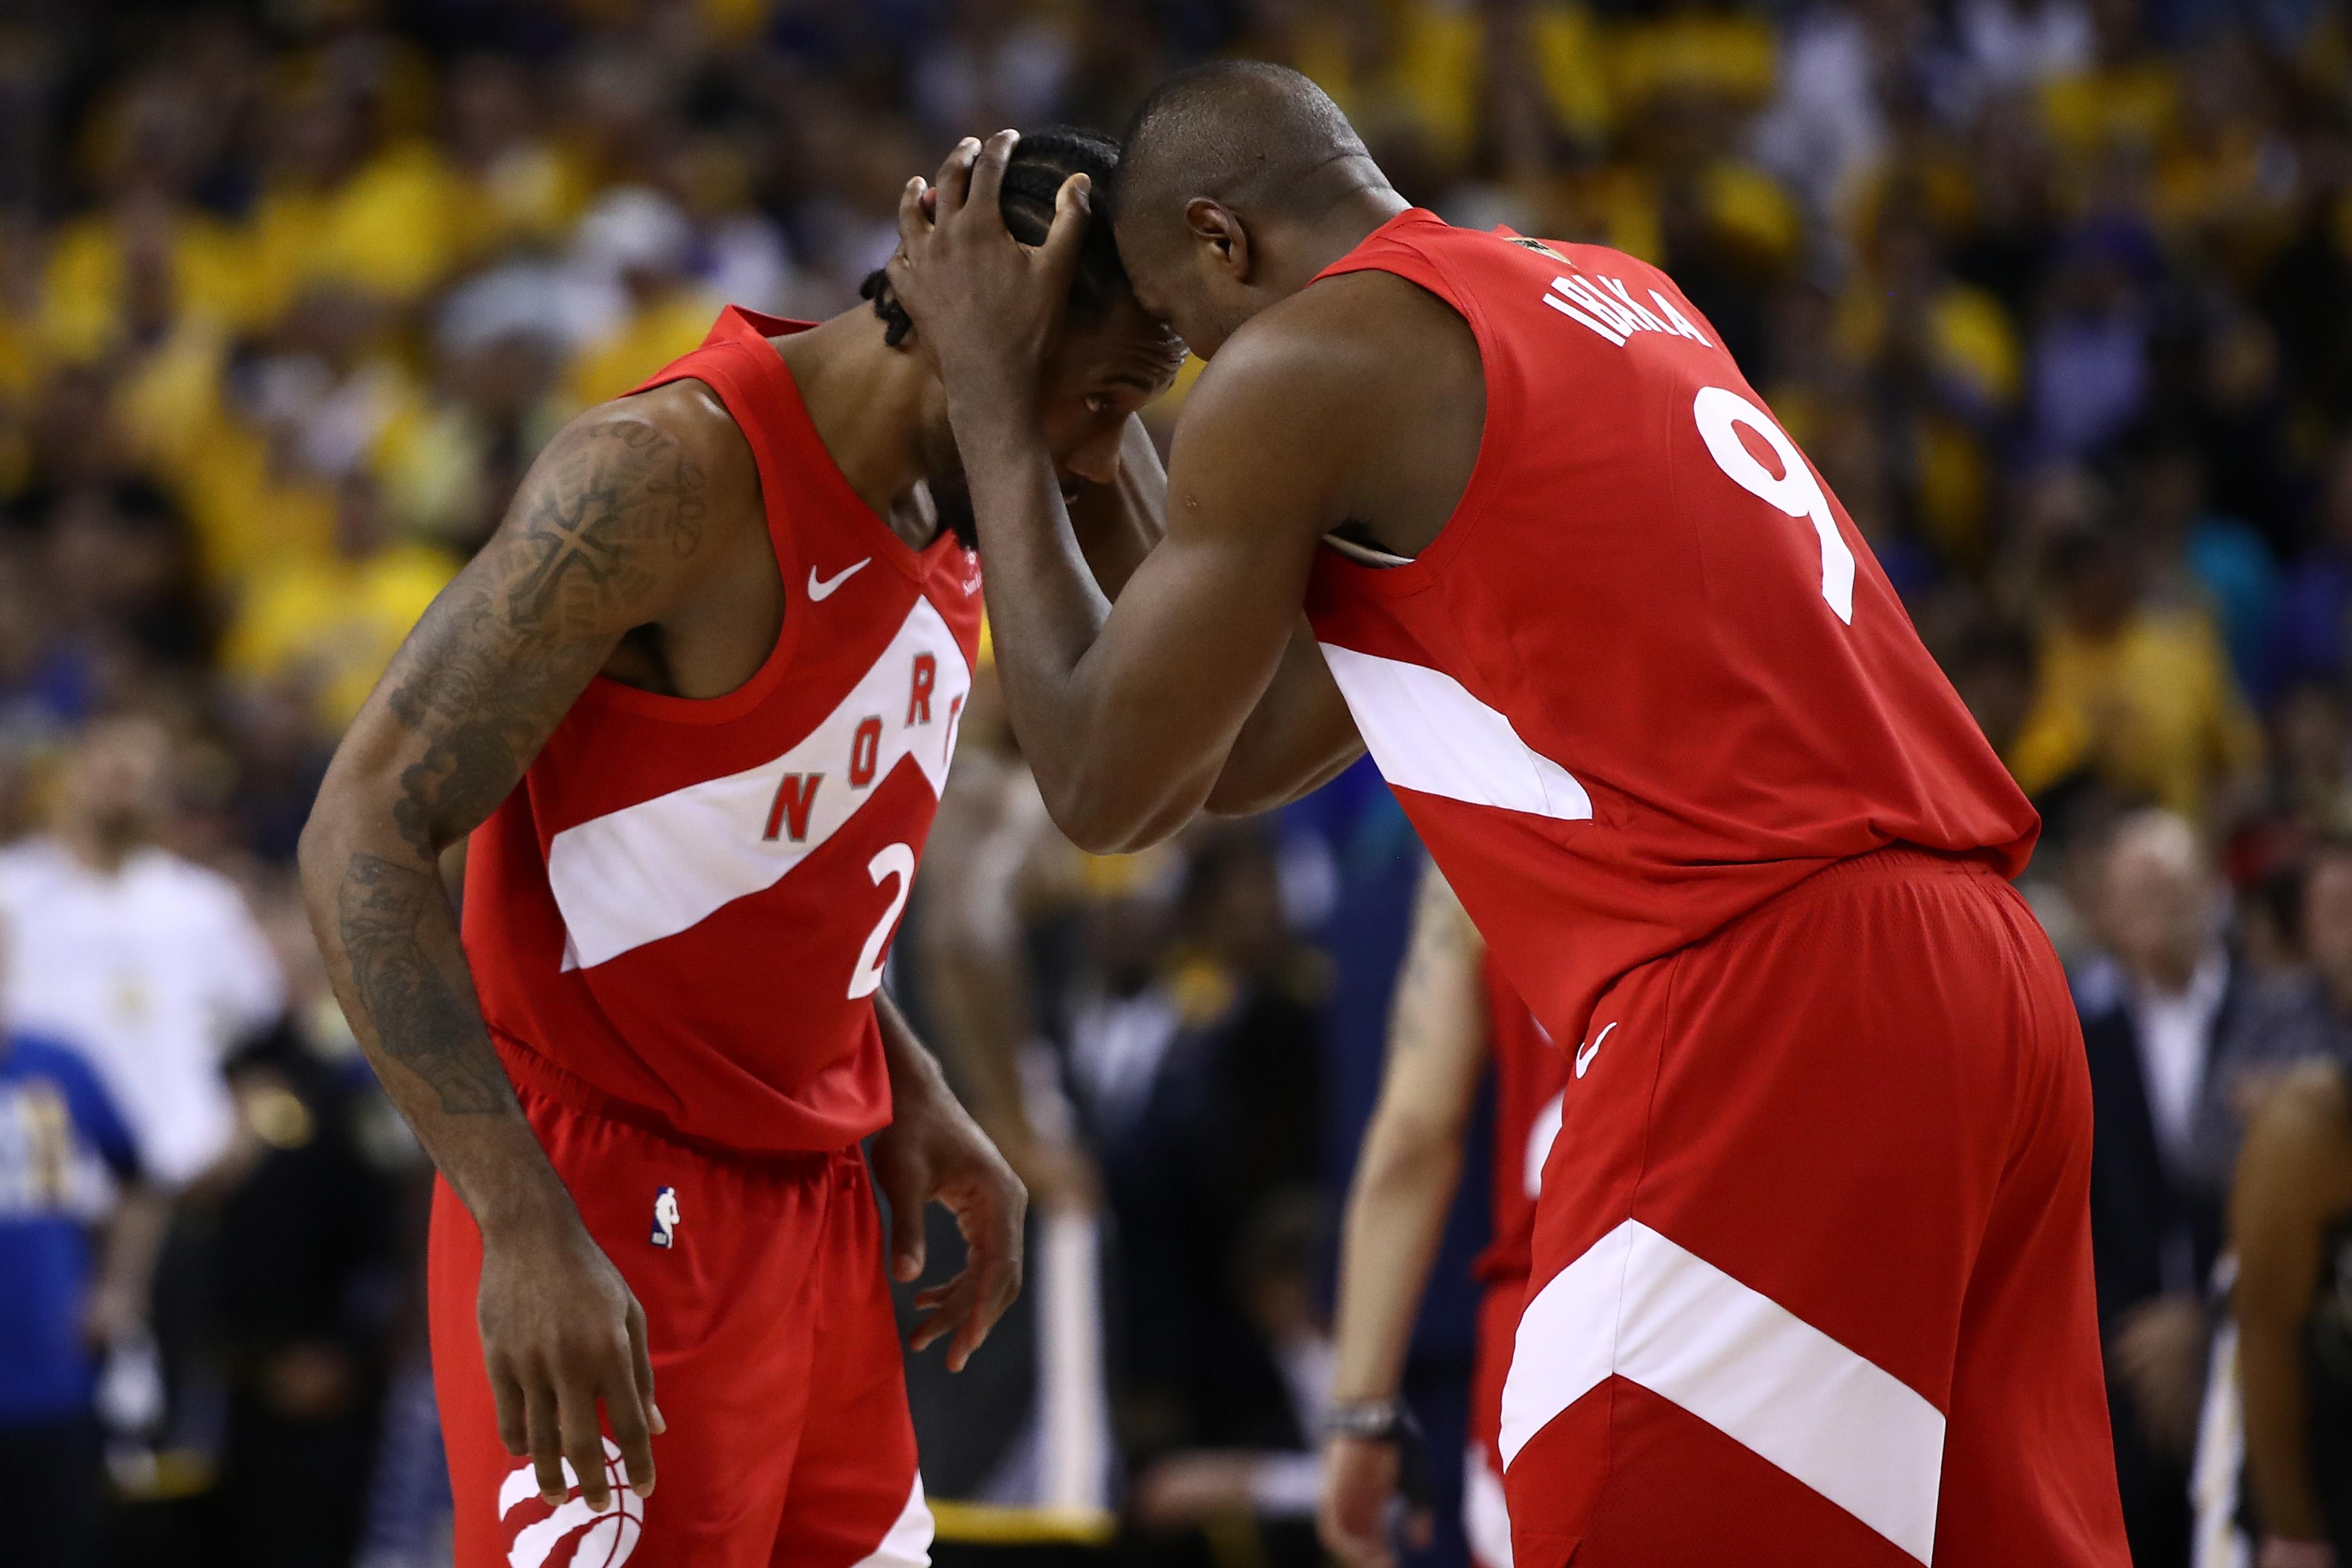 Kawhi Leonard and Serge Ibaka of the Toronto Raptors celebrate a win